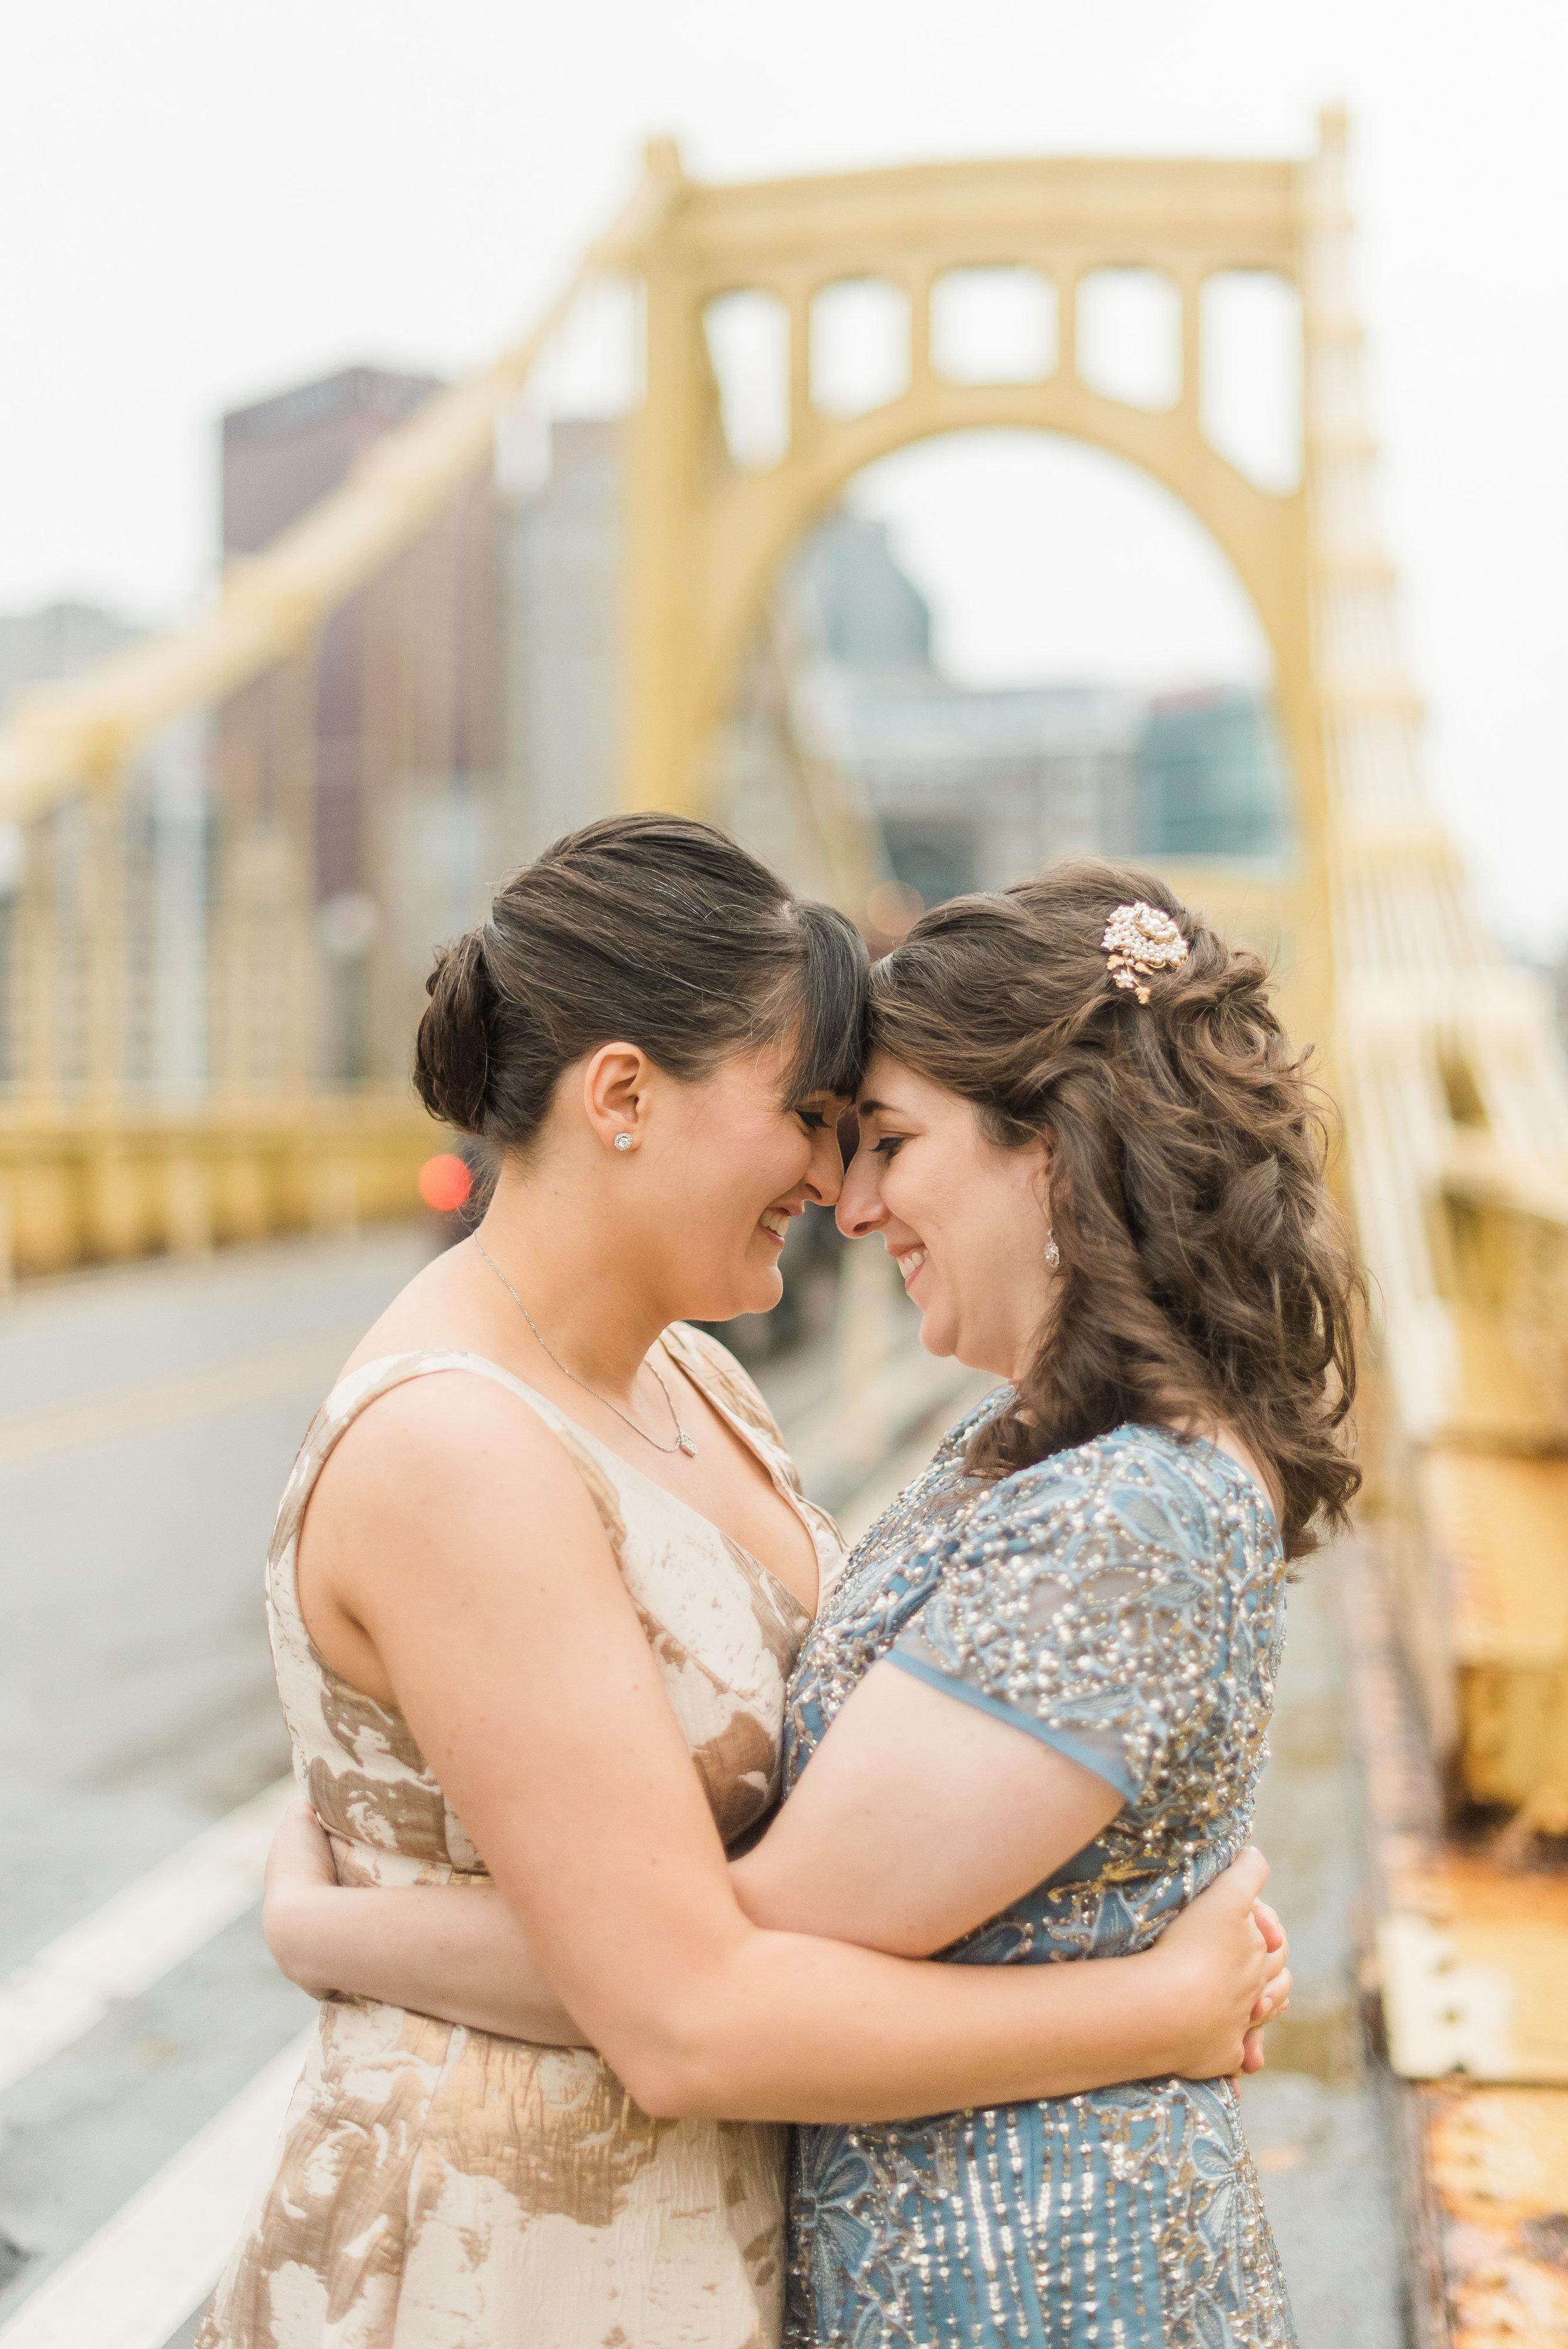 pittsburgh-wedding-photographer-lgbtqfriendly-samesex-city0002.jpg